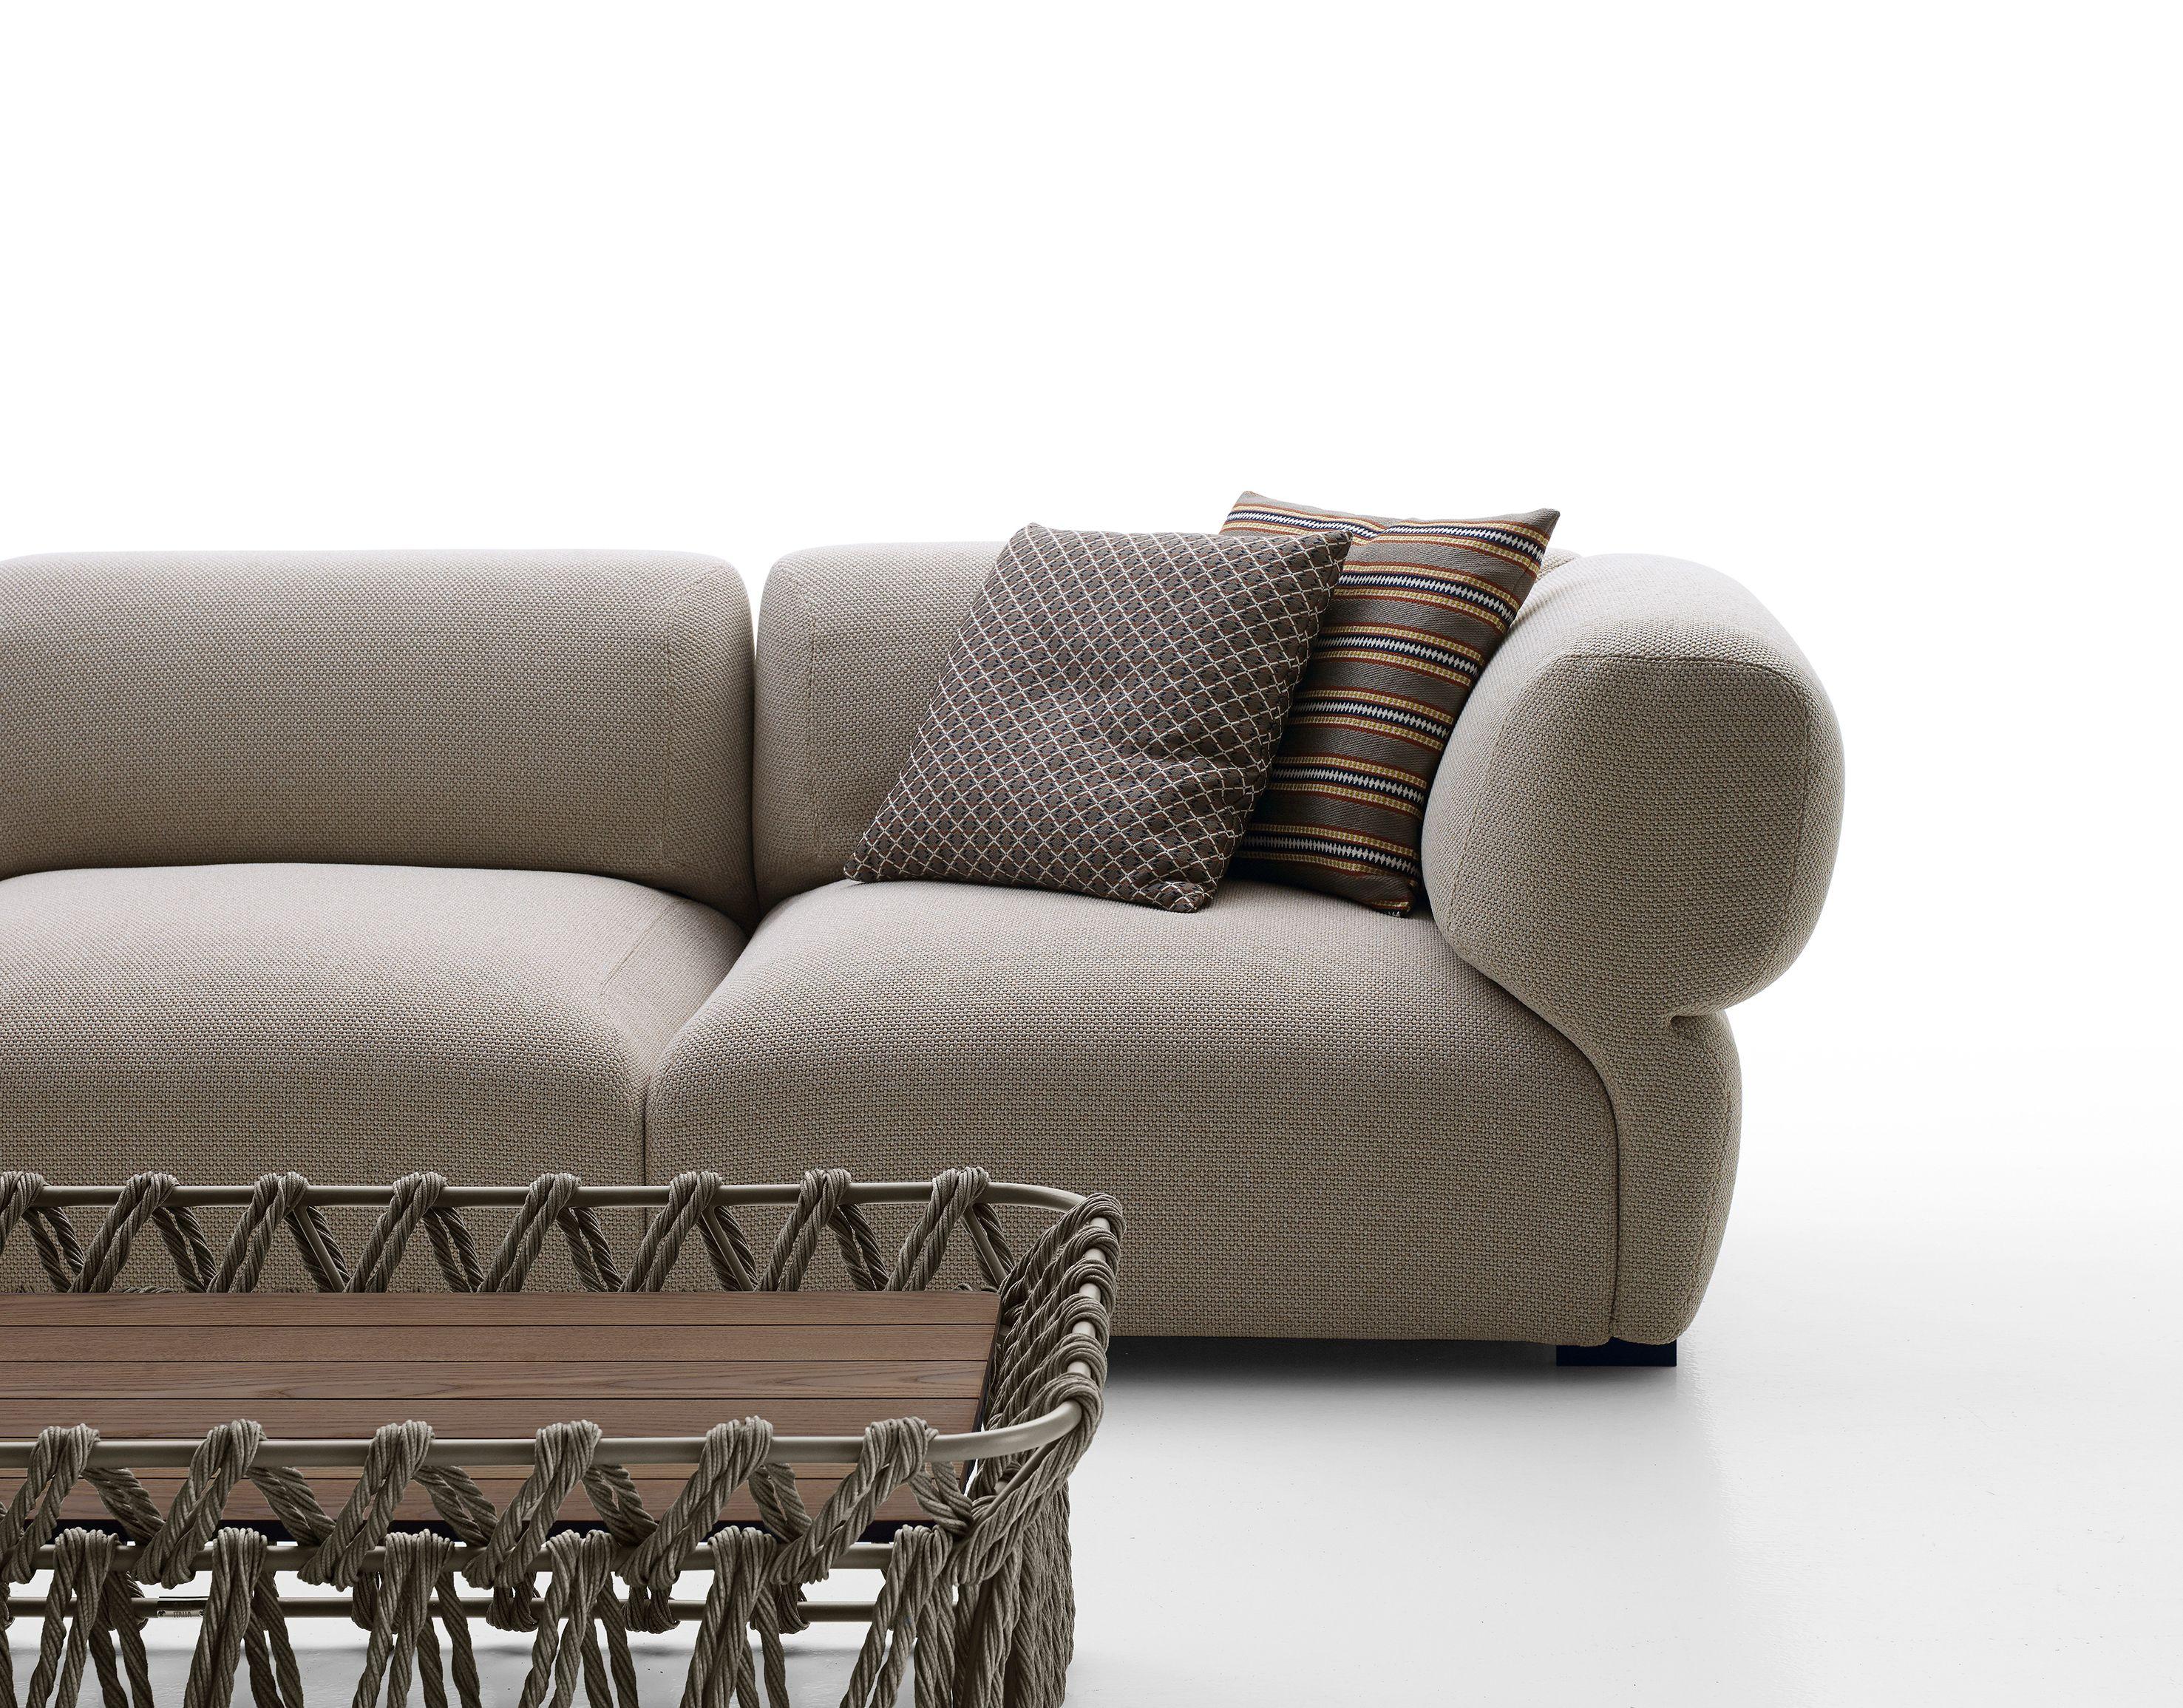 Butterfly sofa by b b italia outdoor a brand of b b for B b italia spa